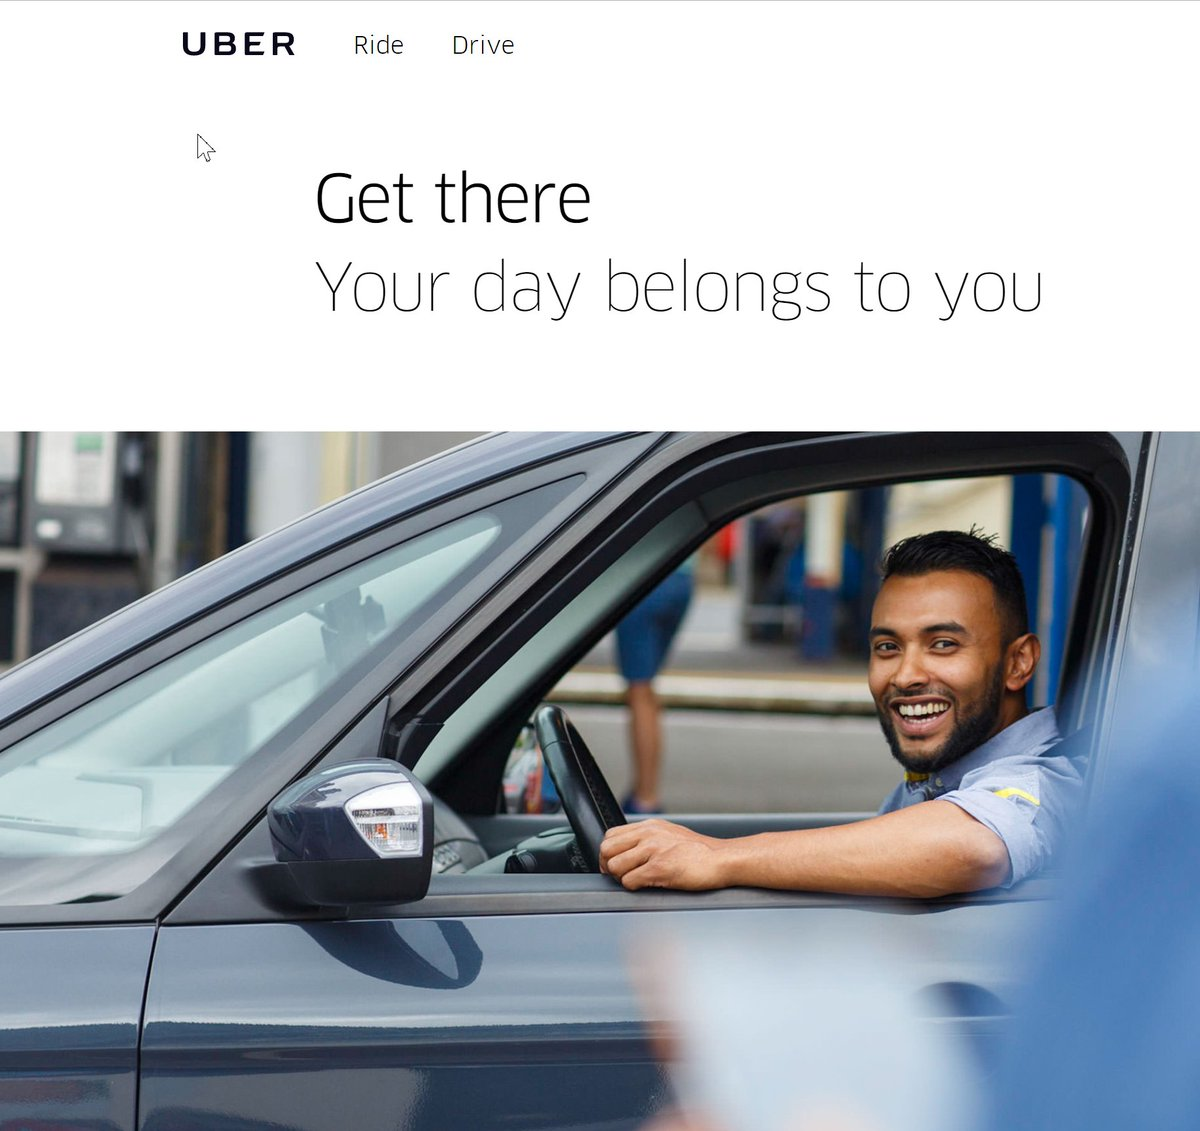 #NYC mayor signs ride-hailing #vehicle cap into law  https:// engt.co/2ODxEJD  &nbsp;    #Autonomous #selfdriving #uber #lyft #carsharing #lidar #radar #processor #smartcity #smartcar #gigeconomy #waymo #google #alphabet #iot #robot #insurance<br>http://pic.twitter.com/QGQW0jda1G